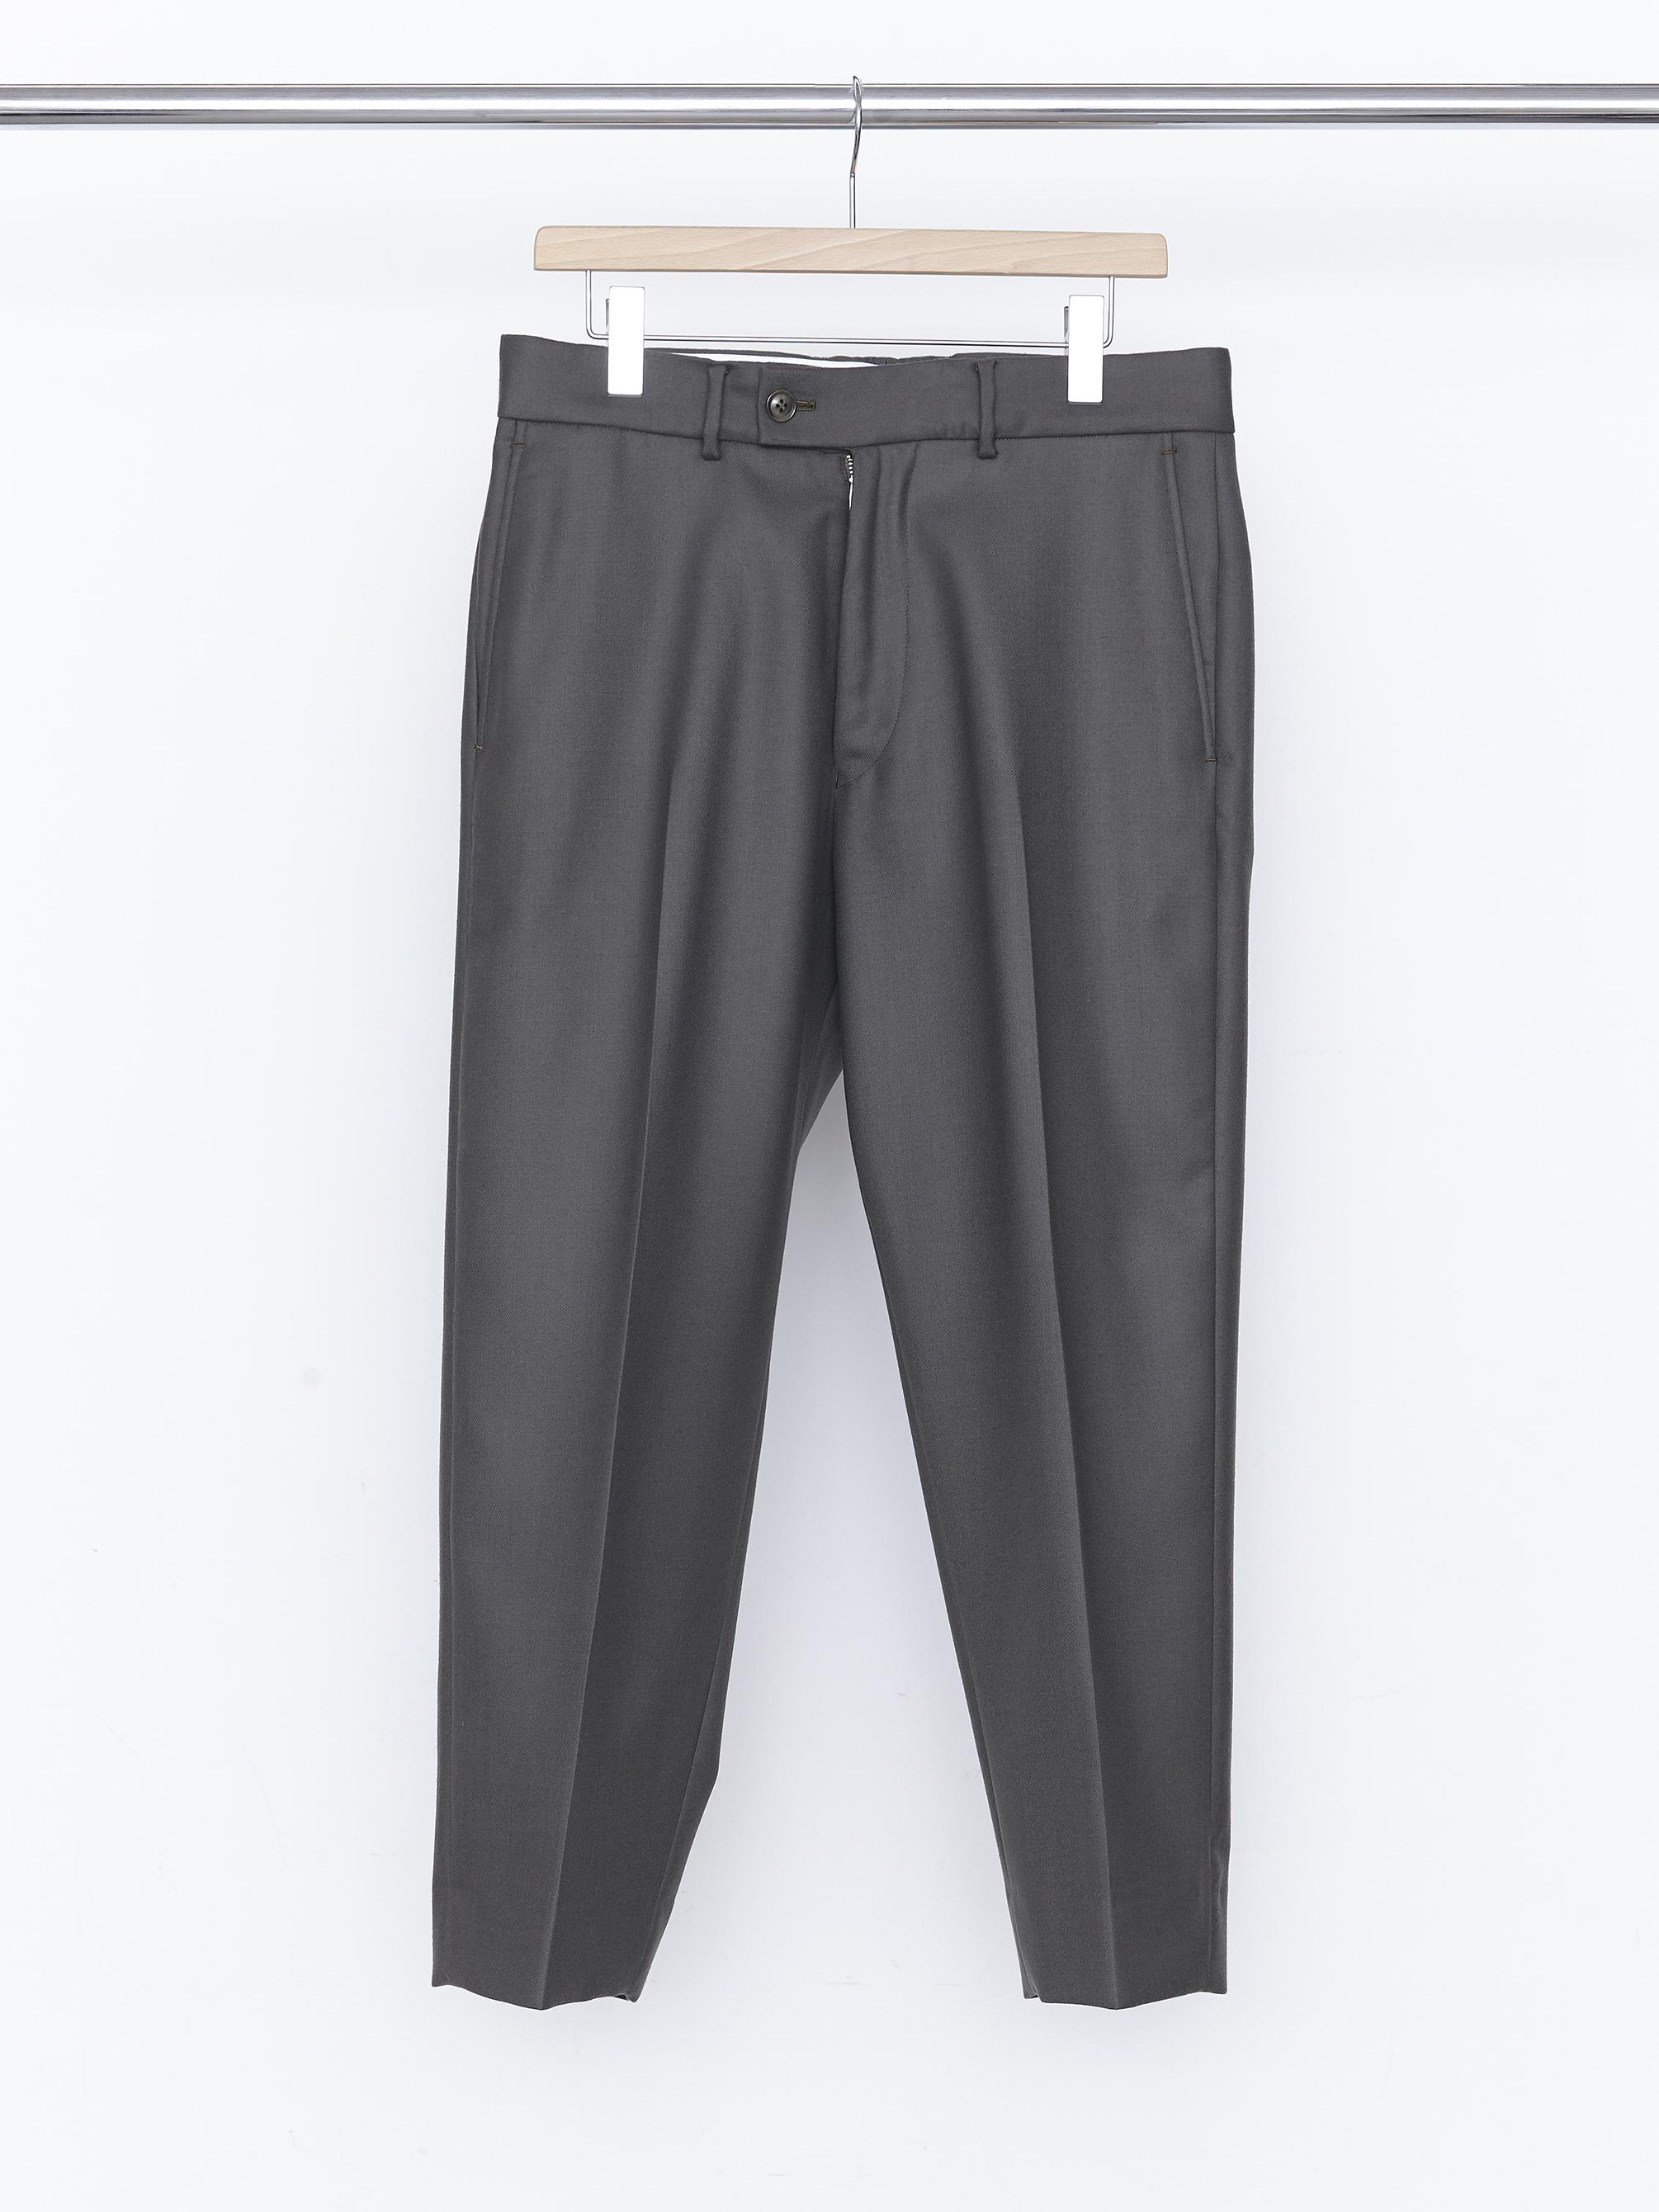 Standard Ankle Slacks - Khaki